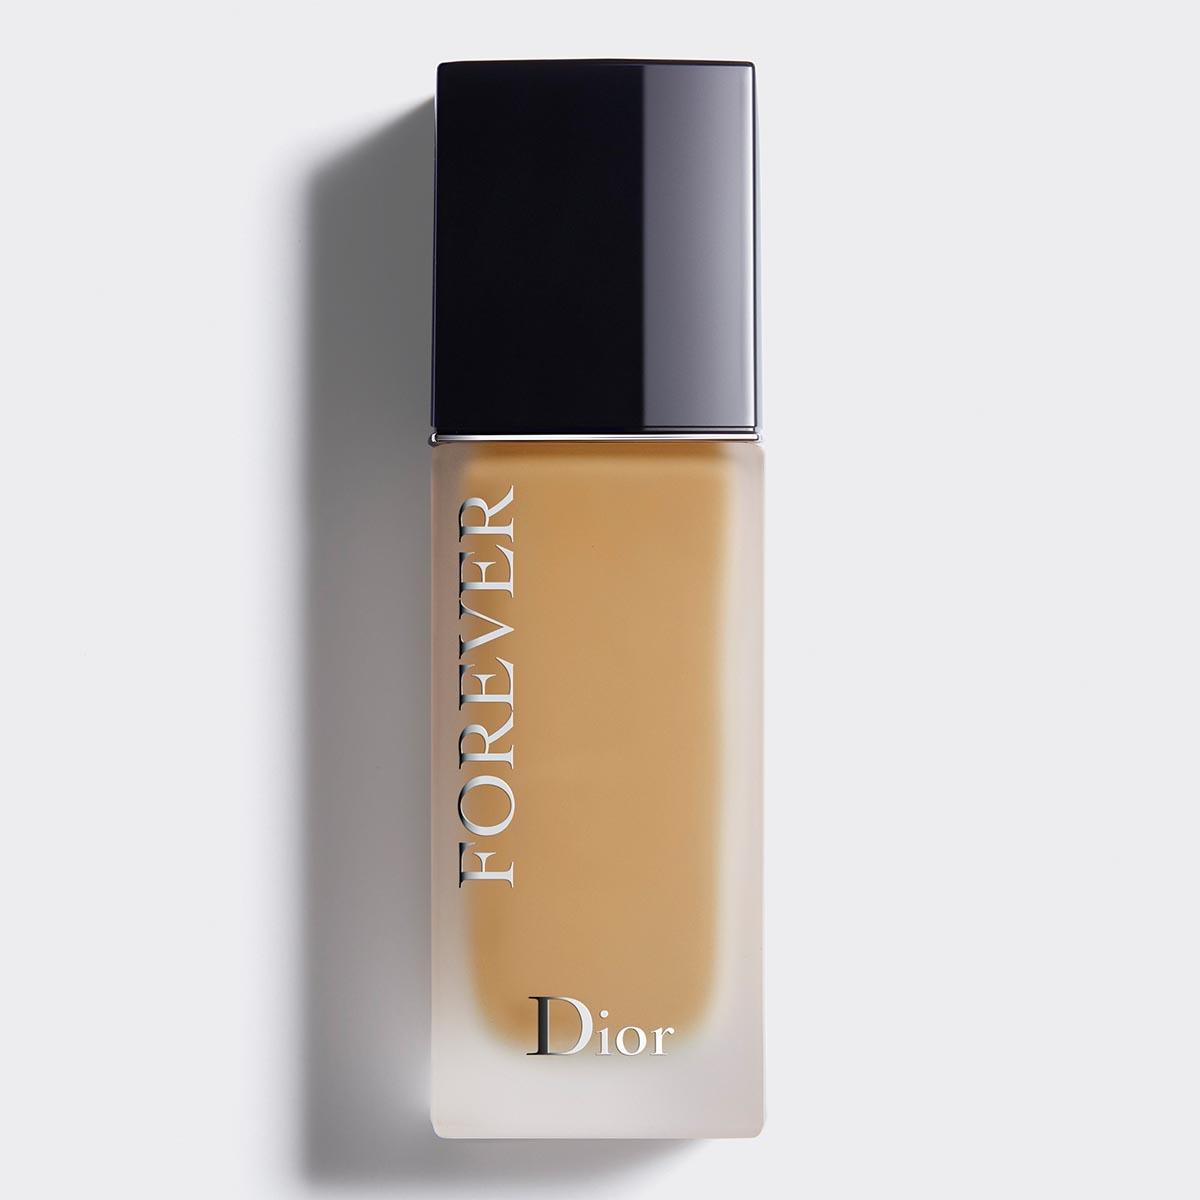 Dior diorskin forever matte base 3w0 warm olive